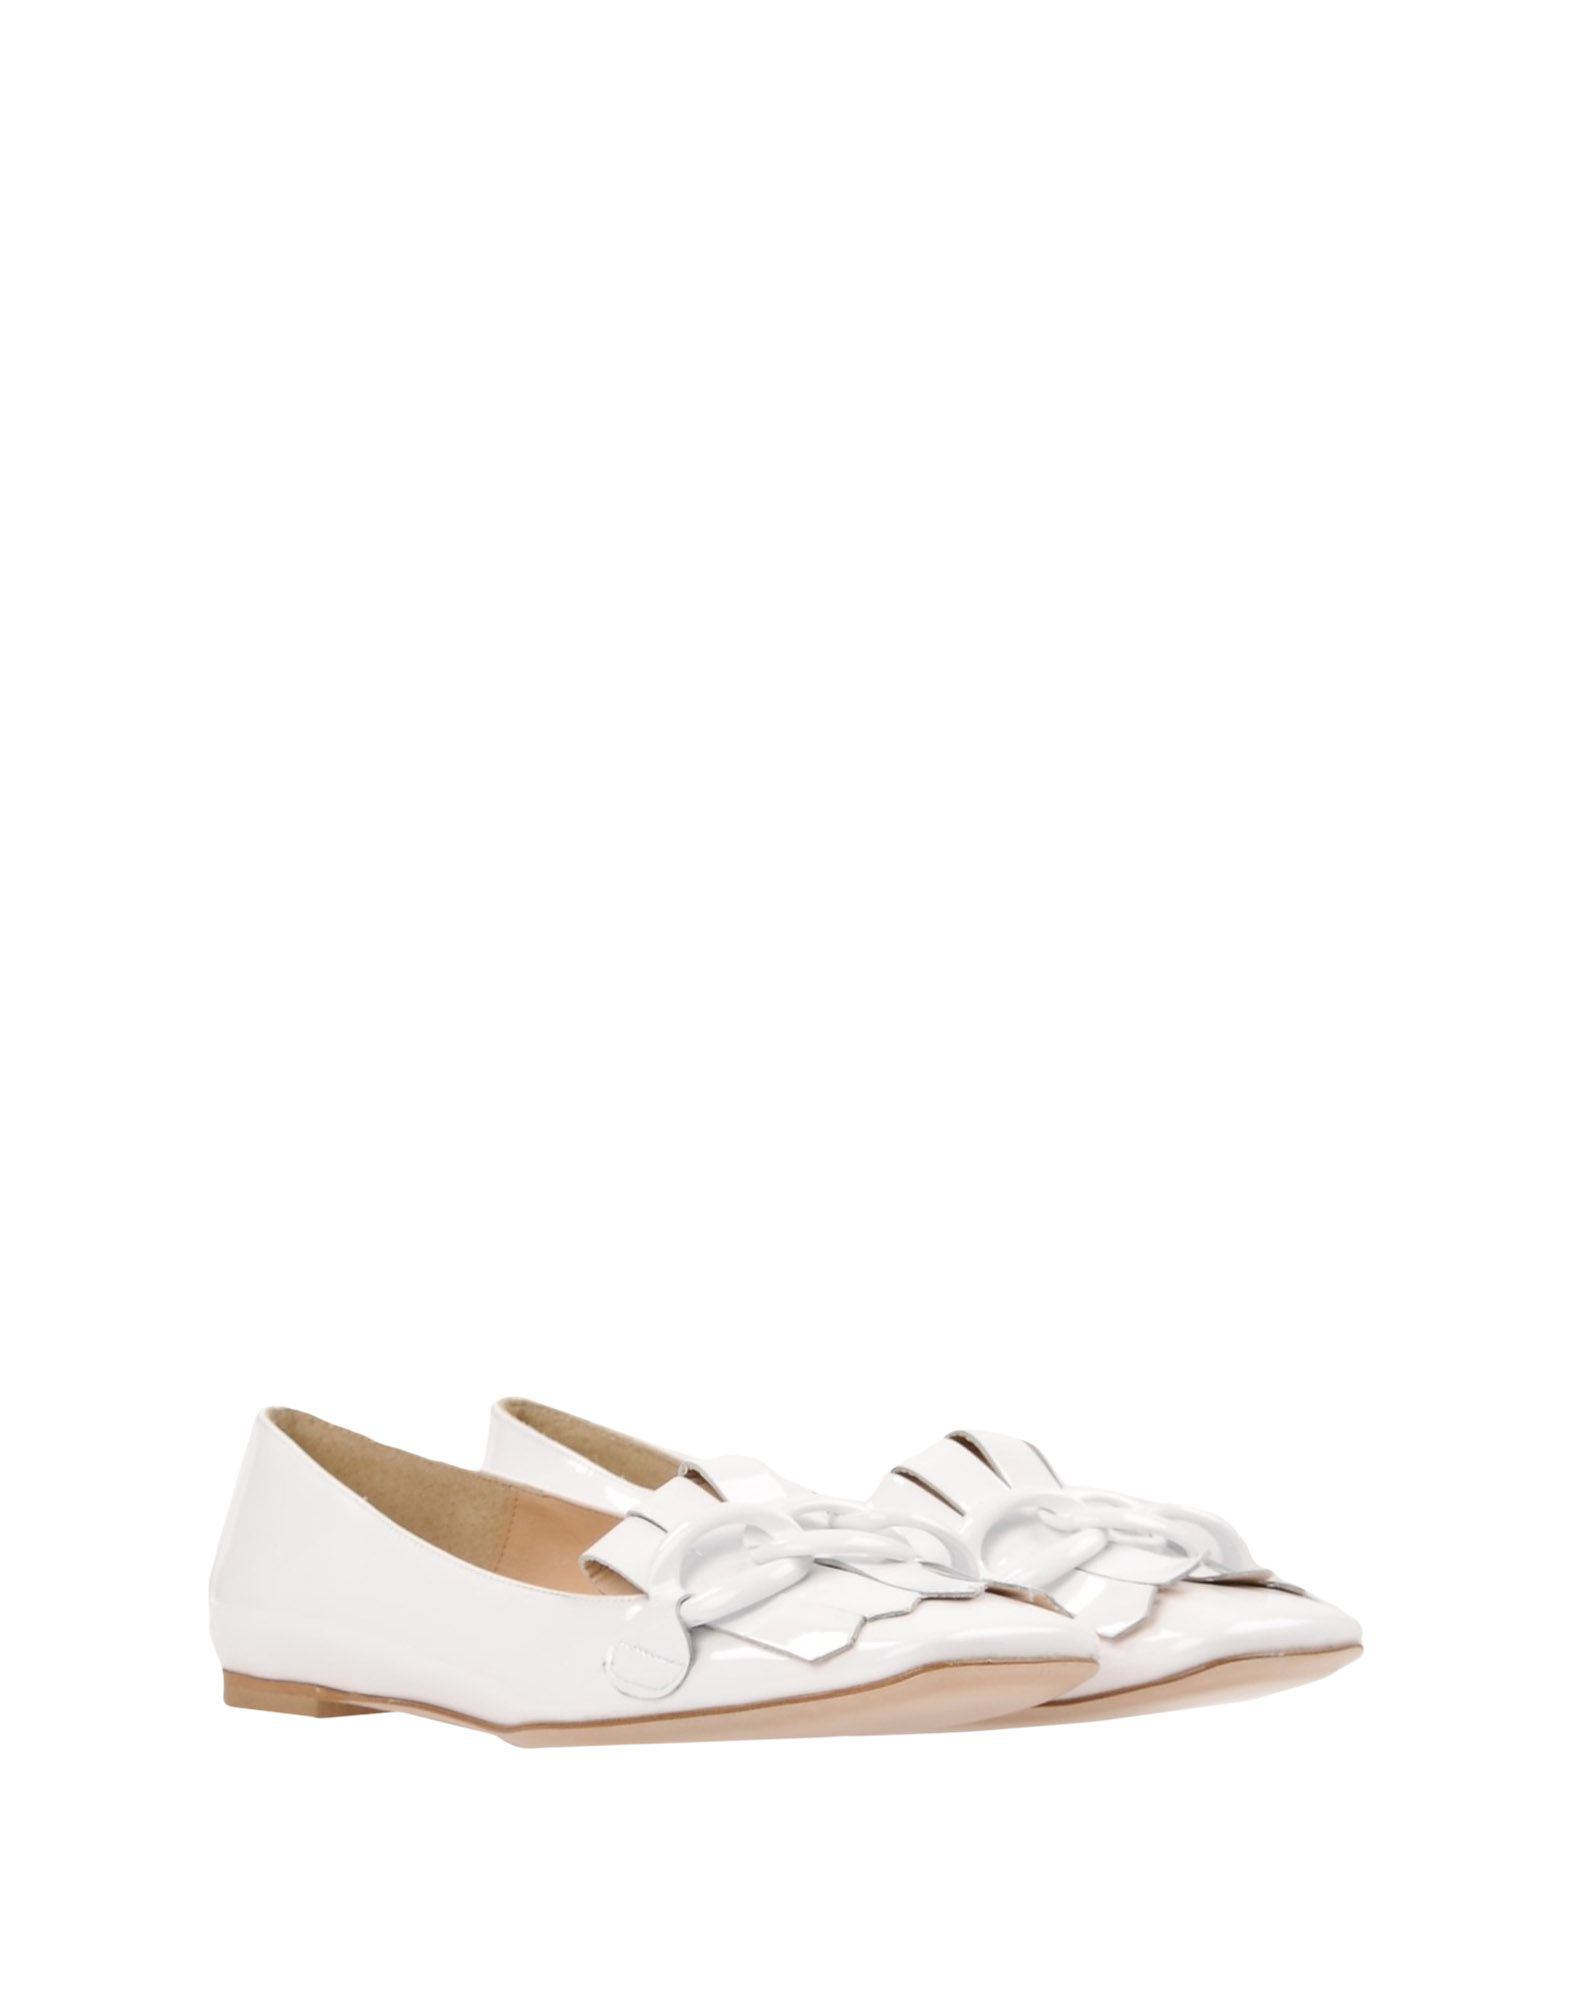 Gut um billige Schuhe Damen zu tragenBianca Di Mokassins Damen Schuhe  11440755DJ 8bc0b7